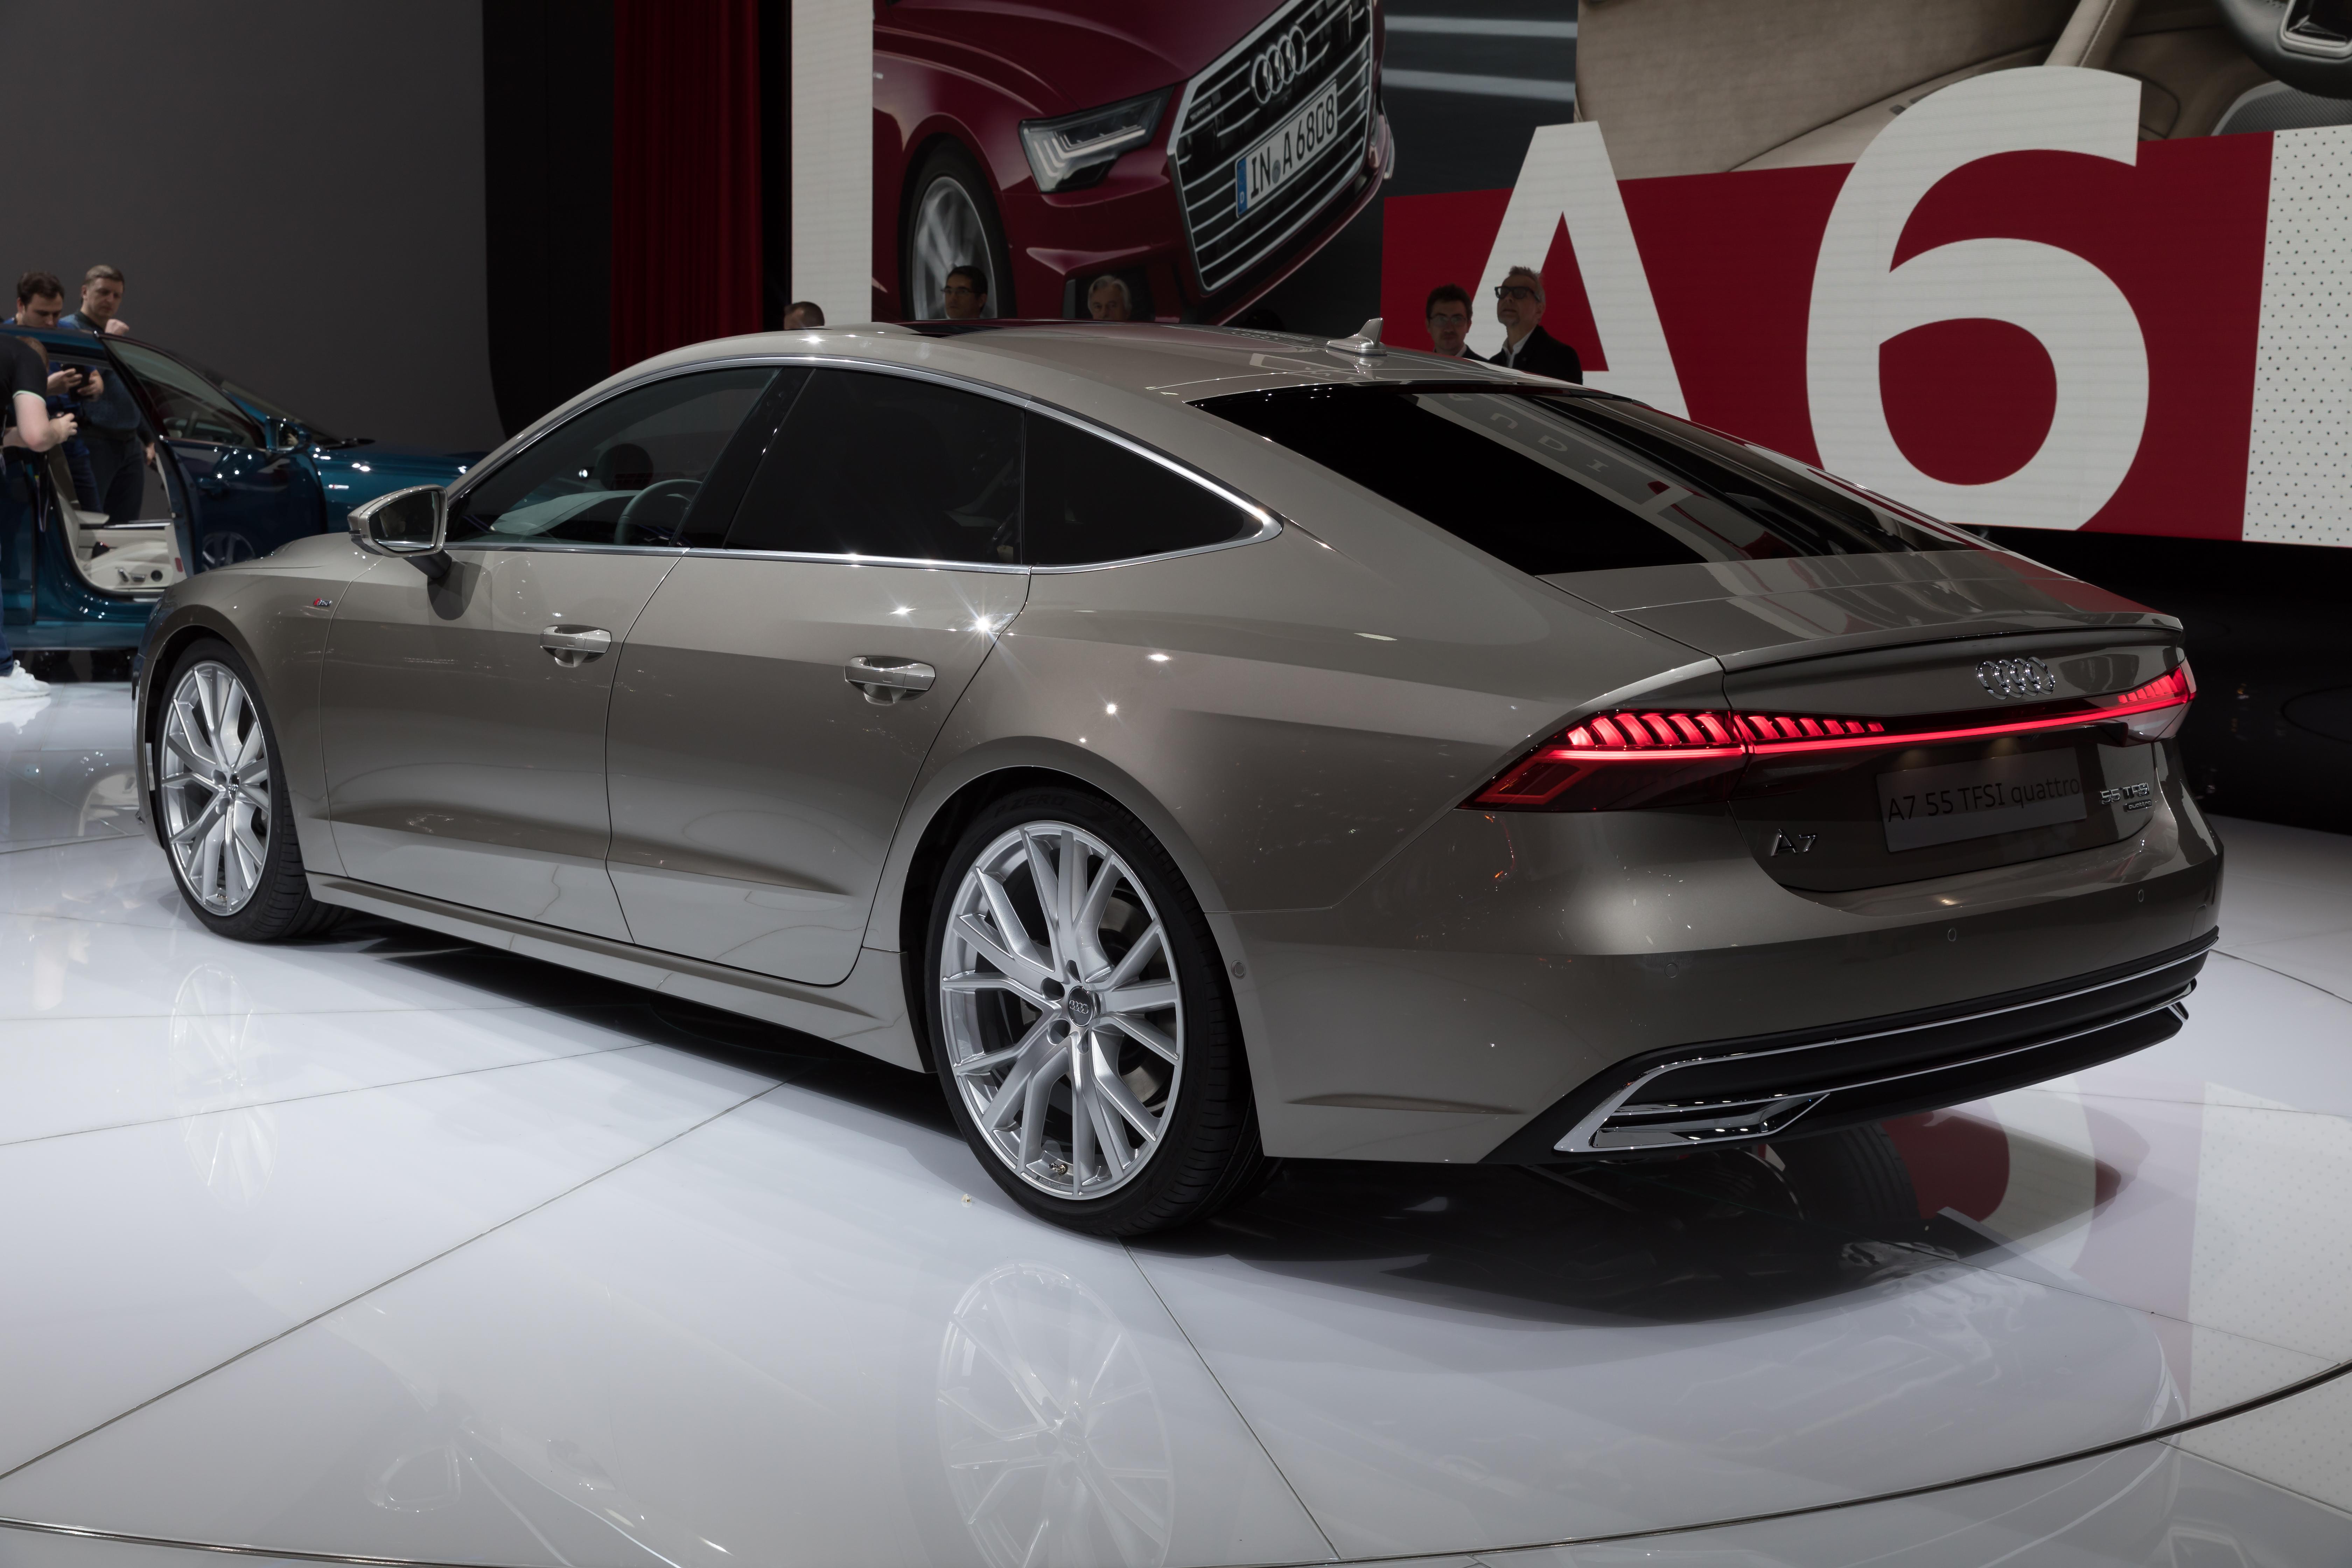 File:Audi A7, GIMS 2018, Le Grand-Saconnex (1X7A1758).jpg ...